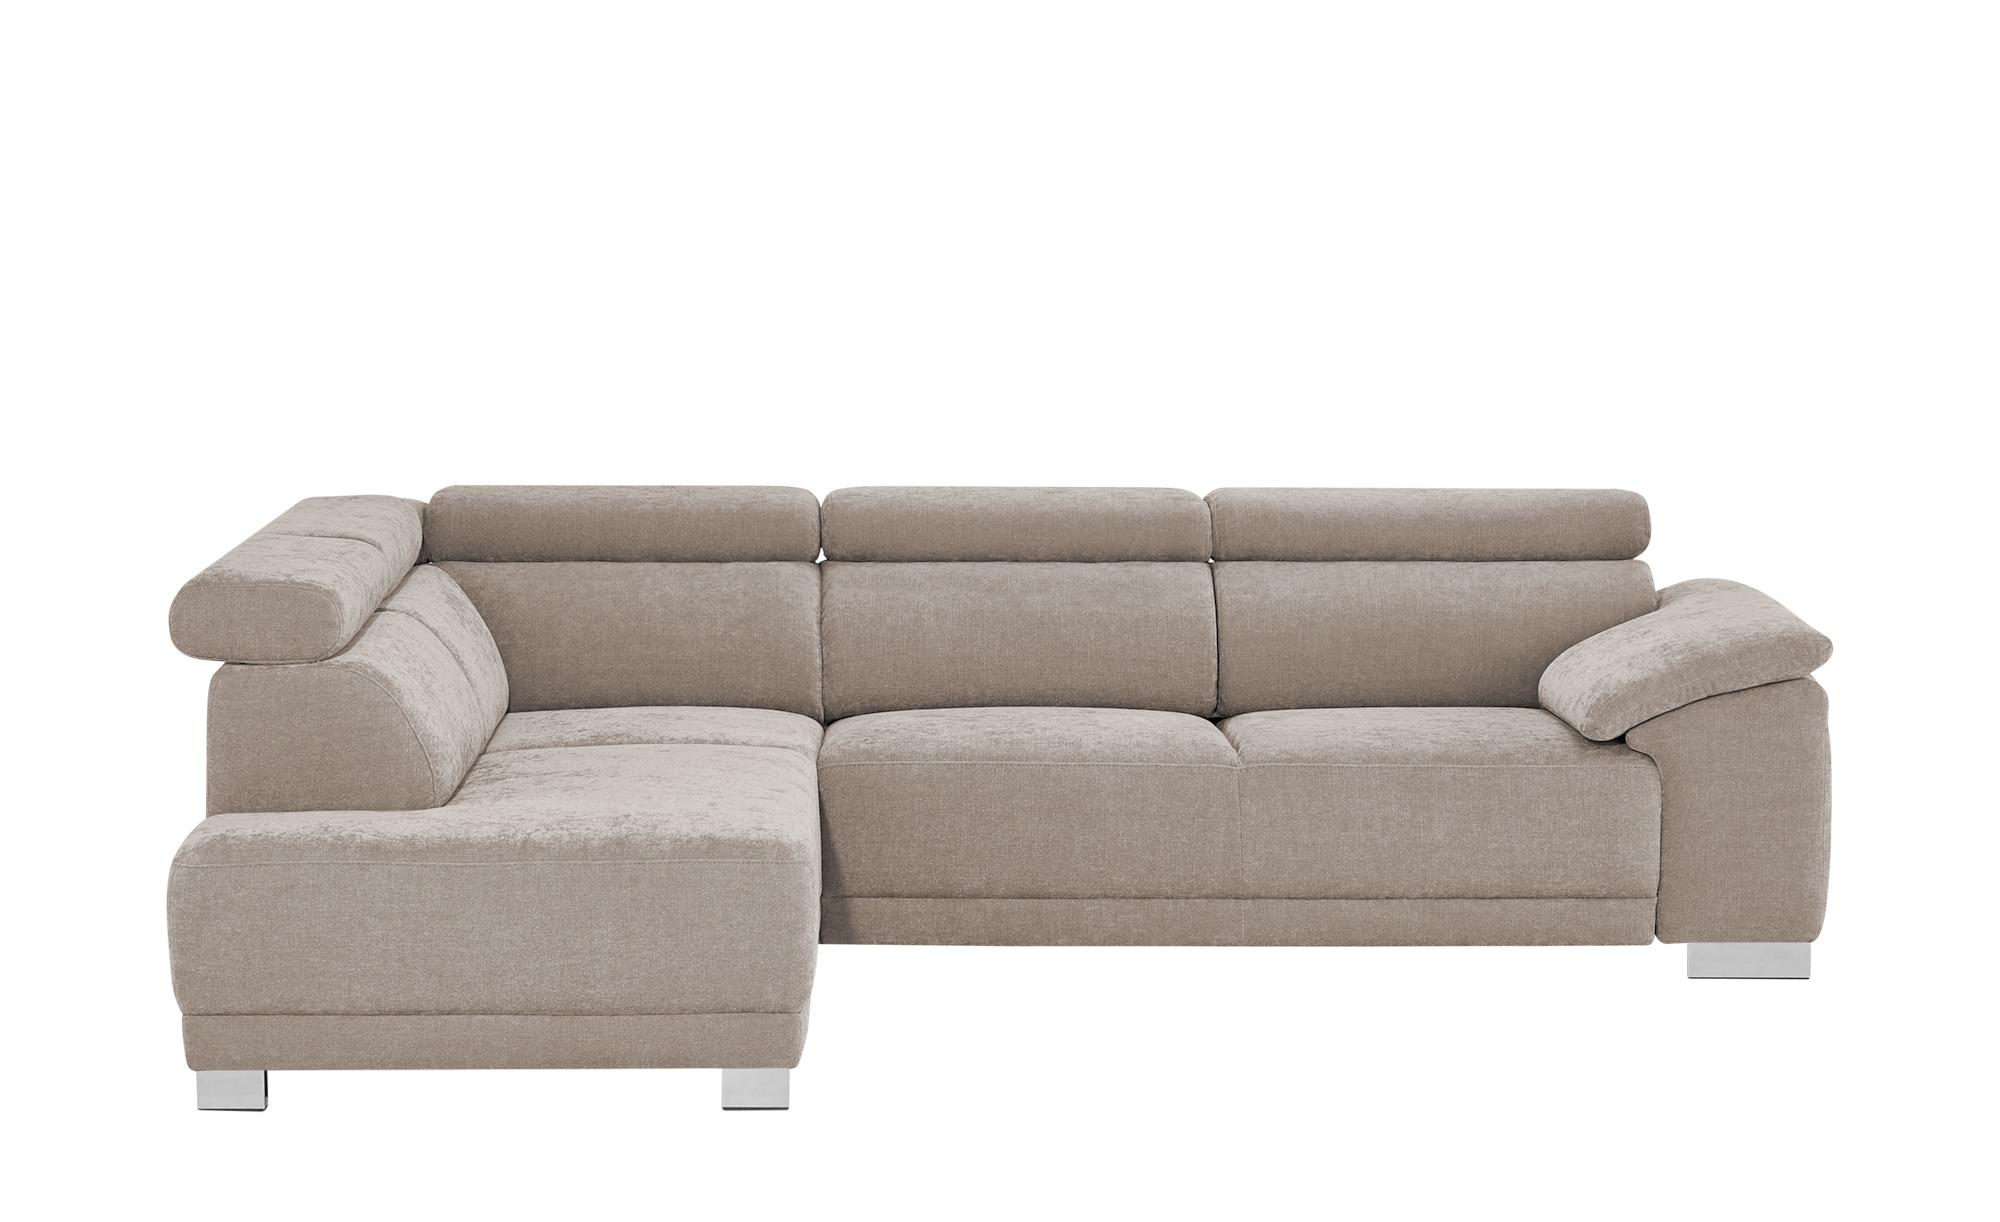 Ecksofa - grau - Polstermöbel > Sofas > Ecksofas - Möbel Kraft günstig online kaufen